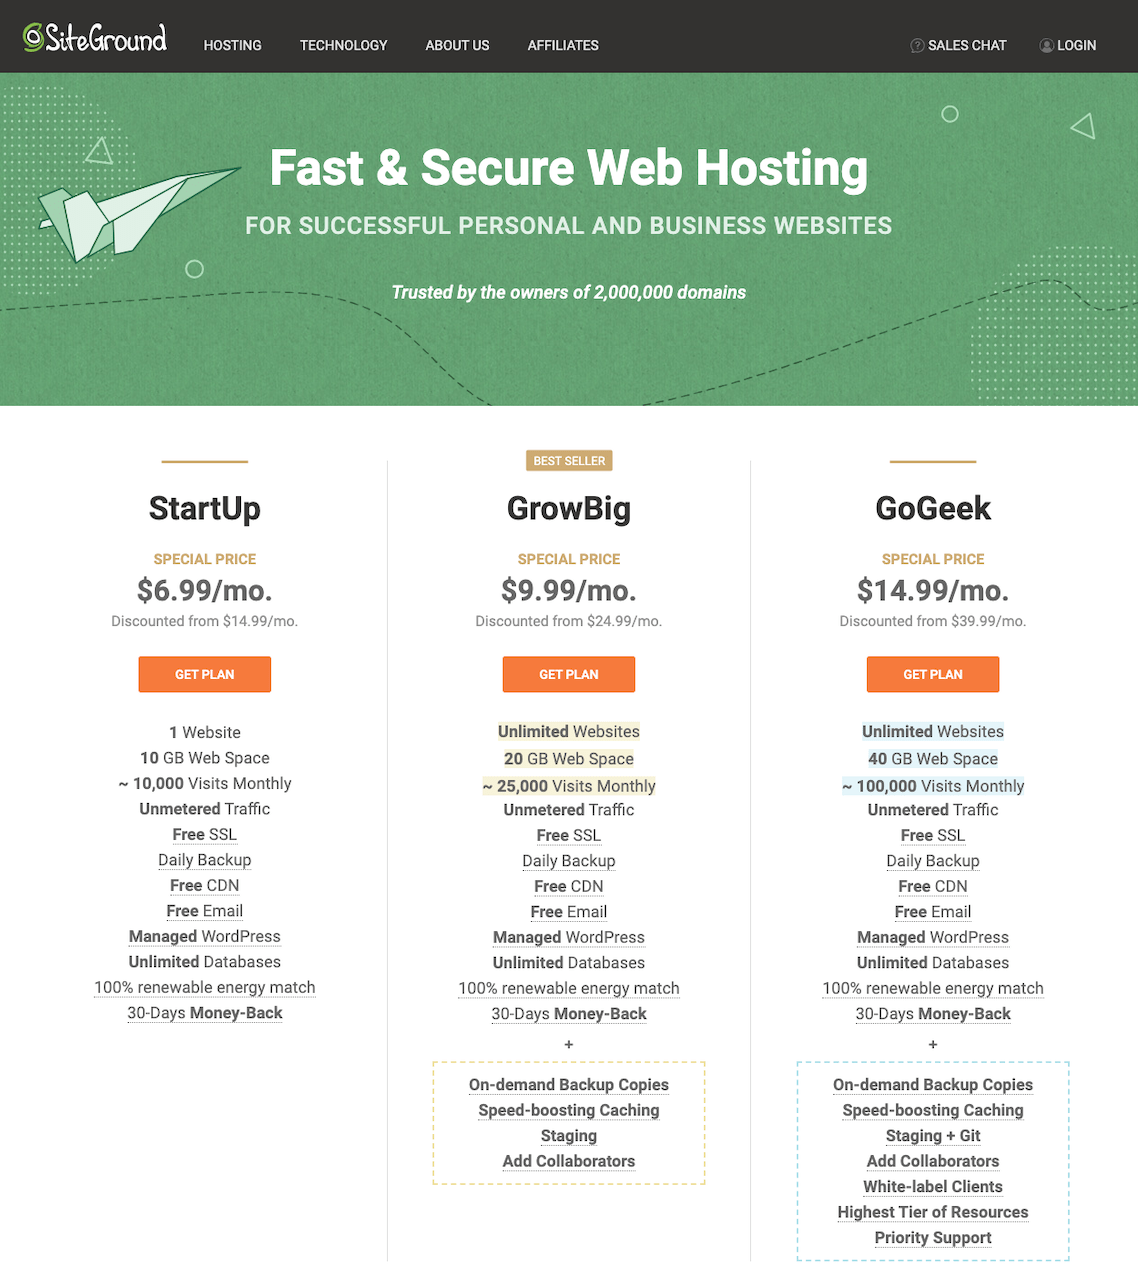 Siteground Shared WordPress Hosting Plan